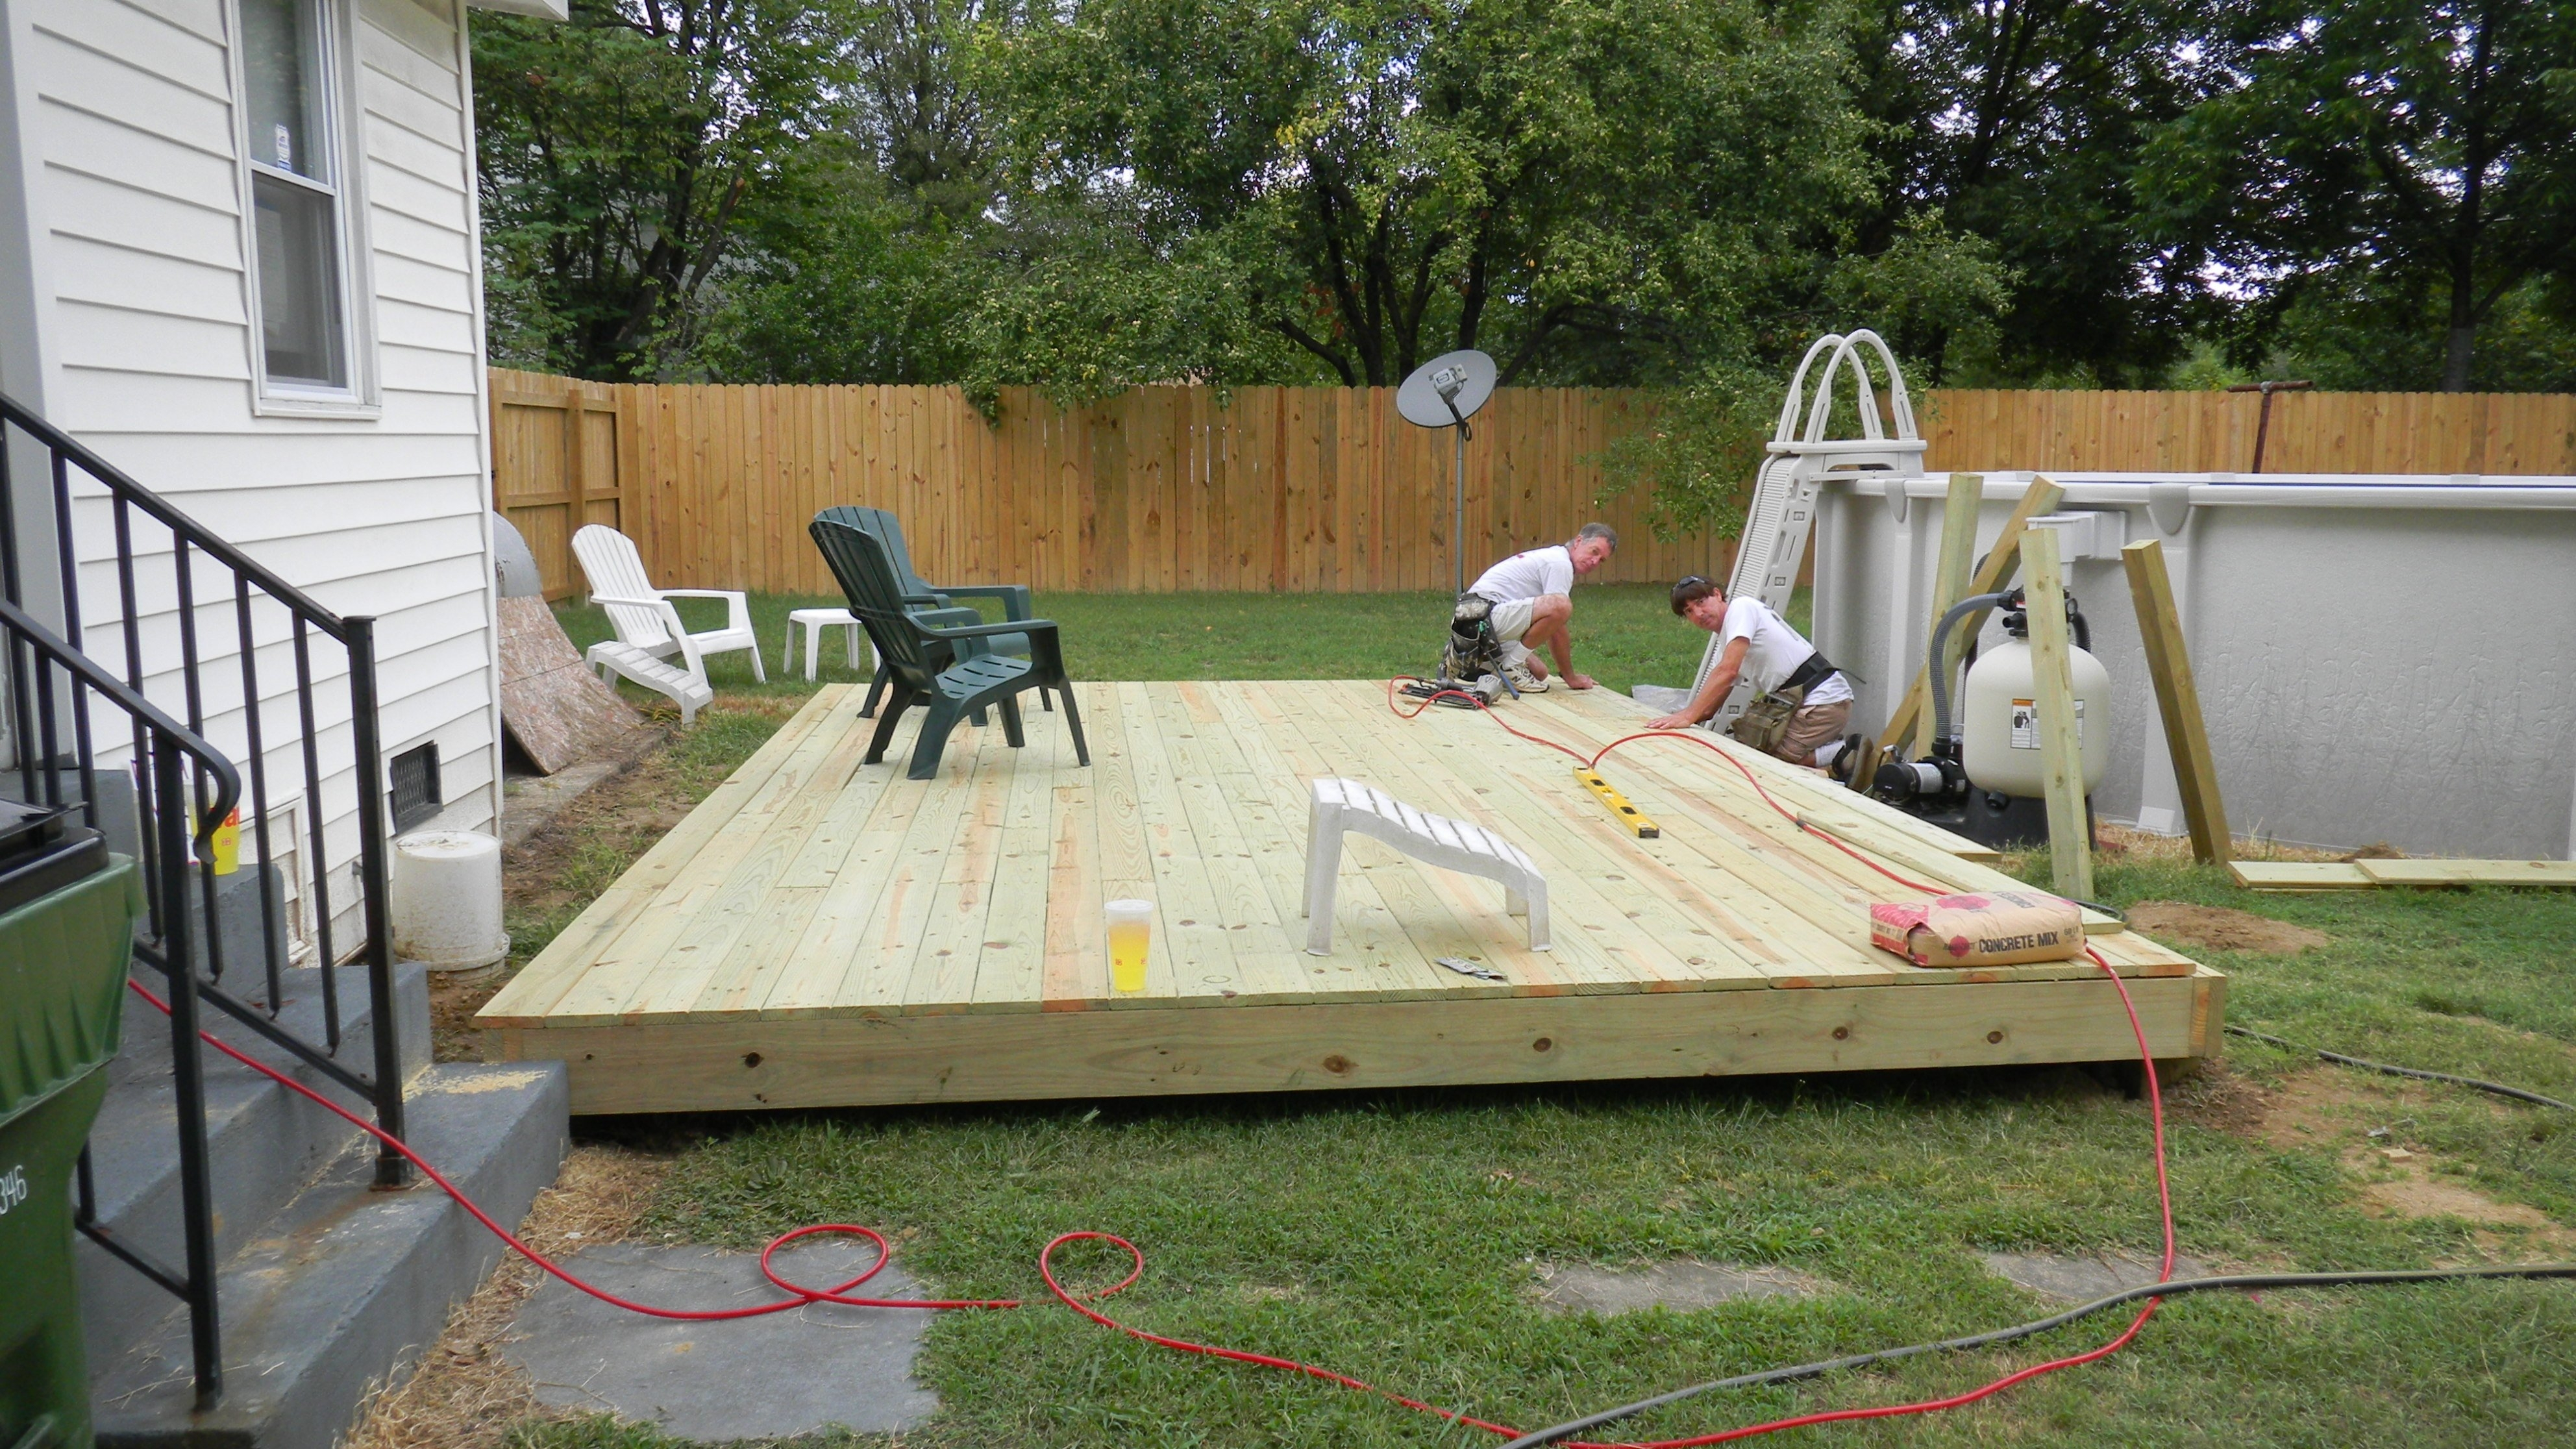 15.SIMPHOME.COM popular low back deck idea on a budget with 10 cheap backyard deck ideas